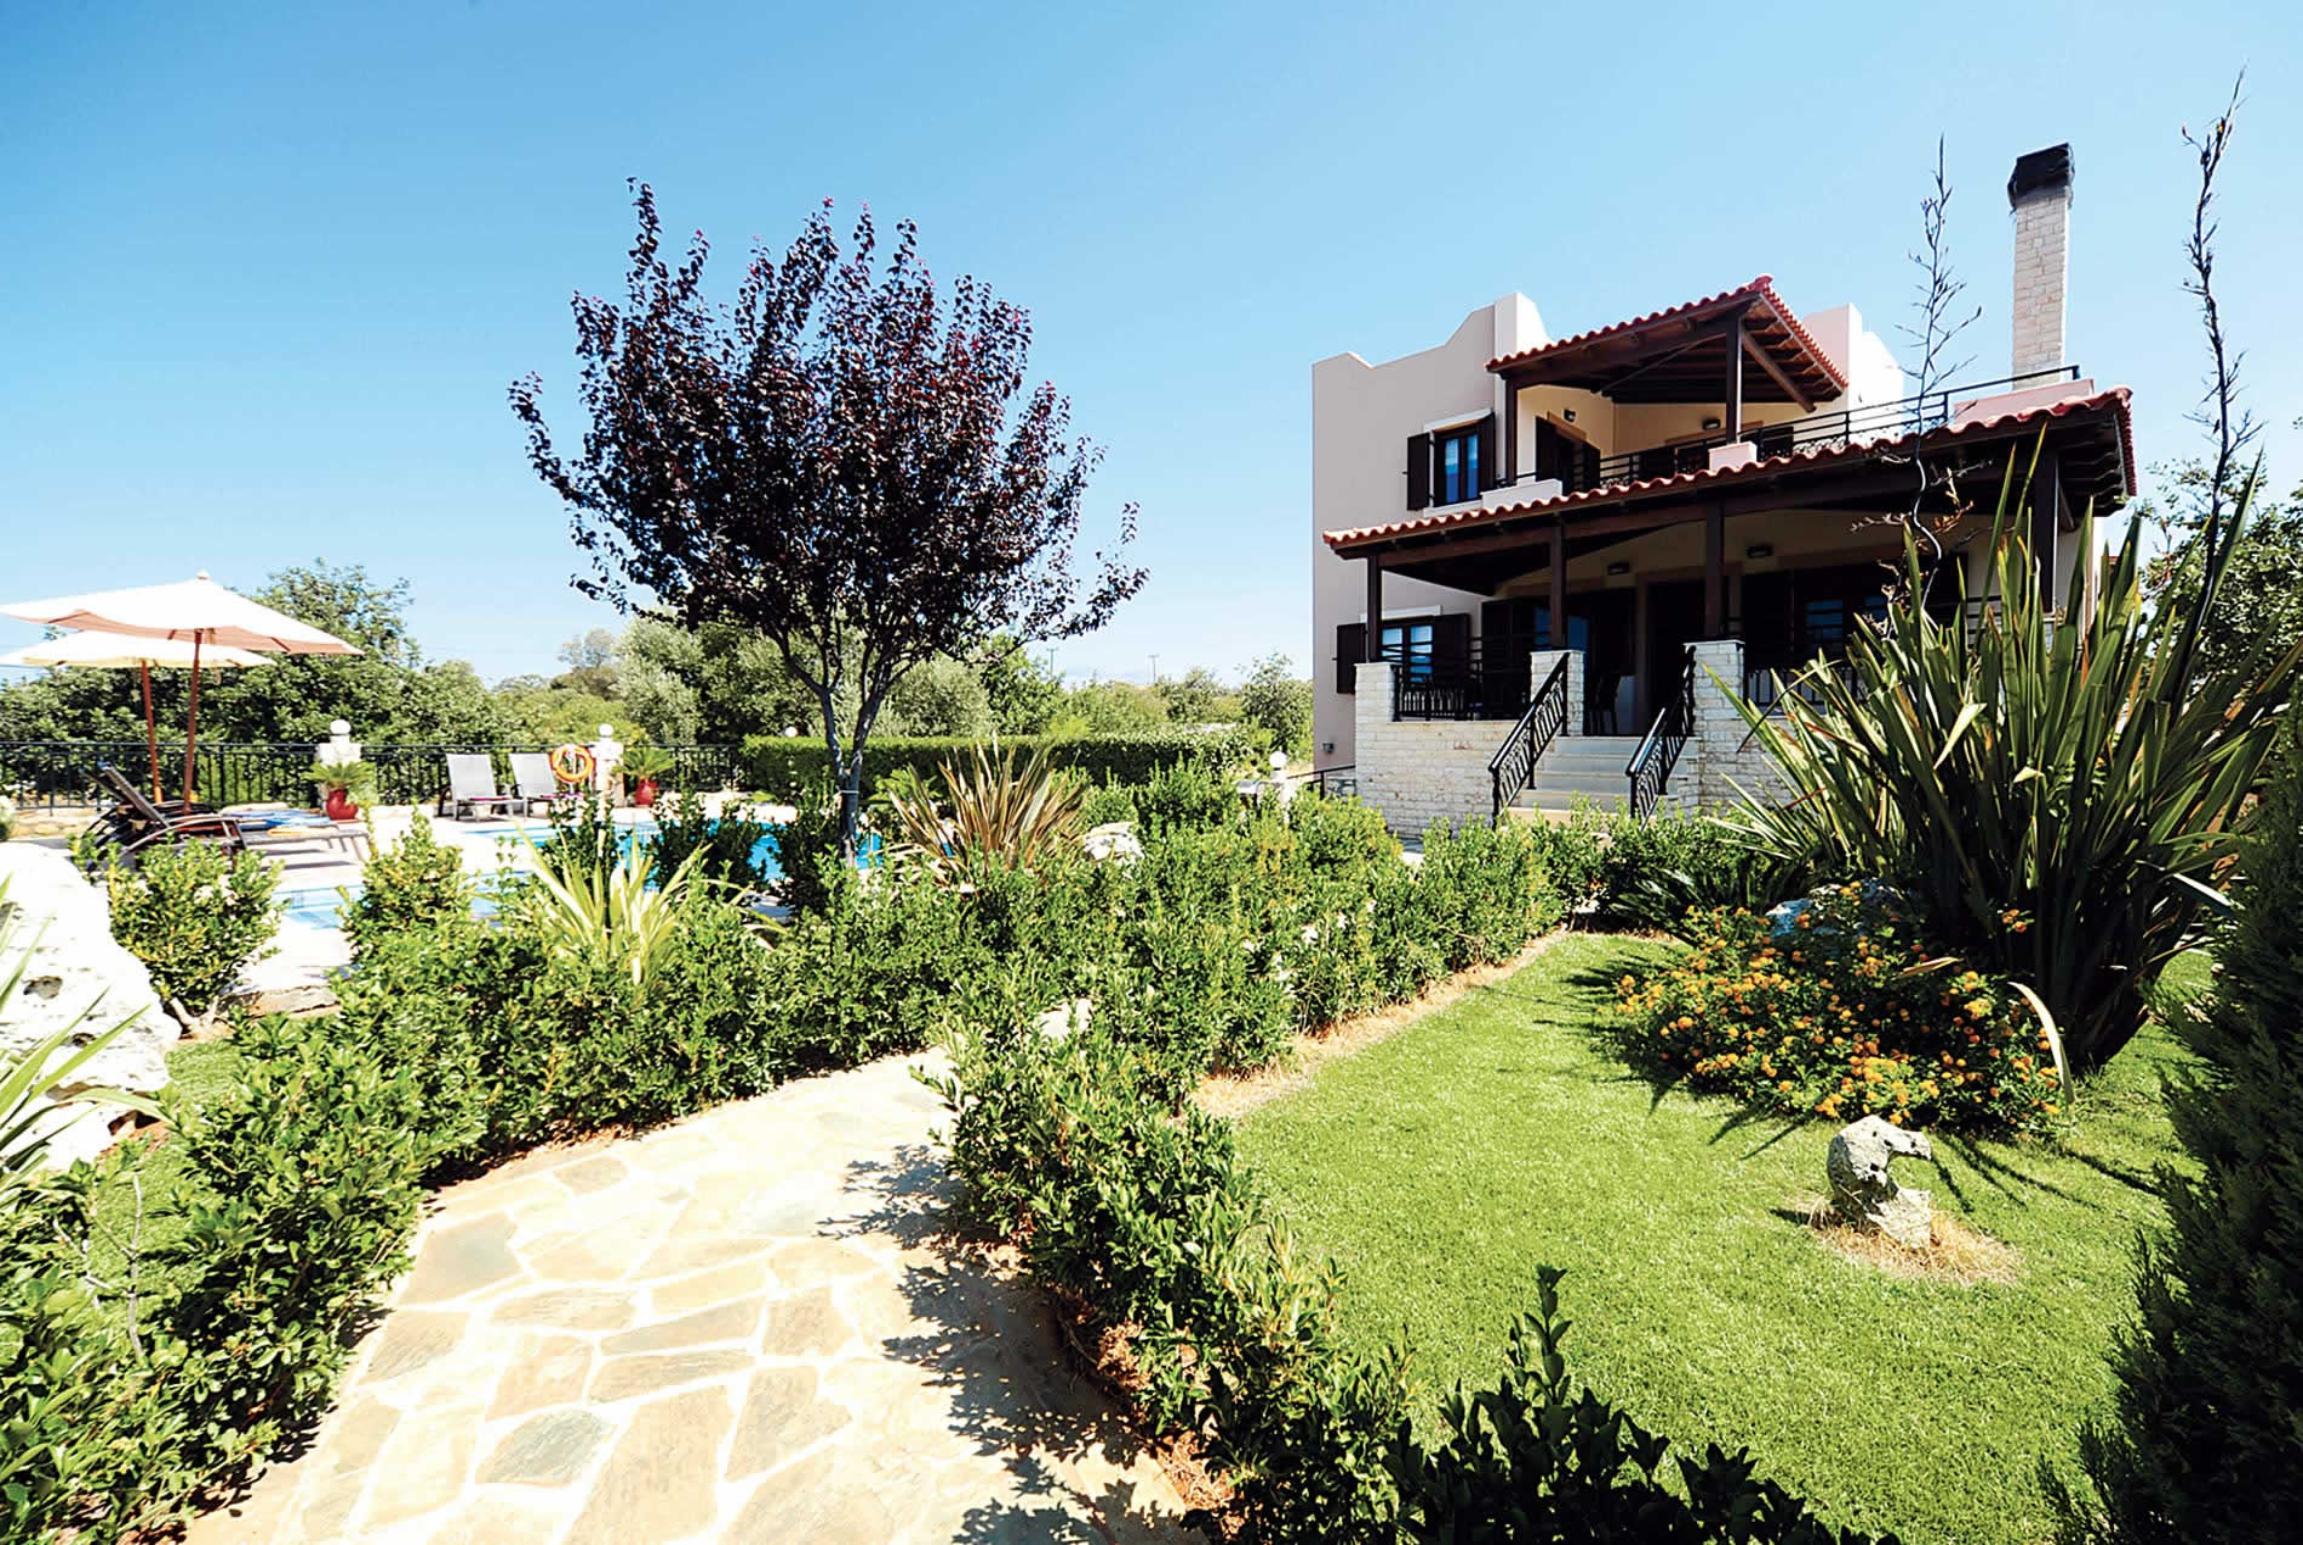 Ferienhaus Nefeli (2653931), Rethymno, Kreta Nordküste, Kreta, Griechenland, Bild 12